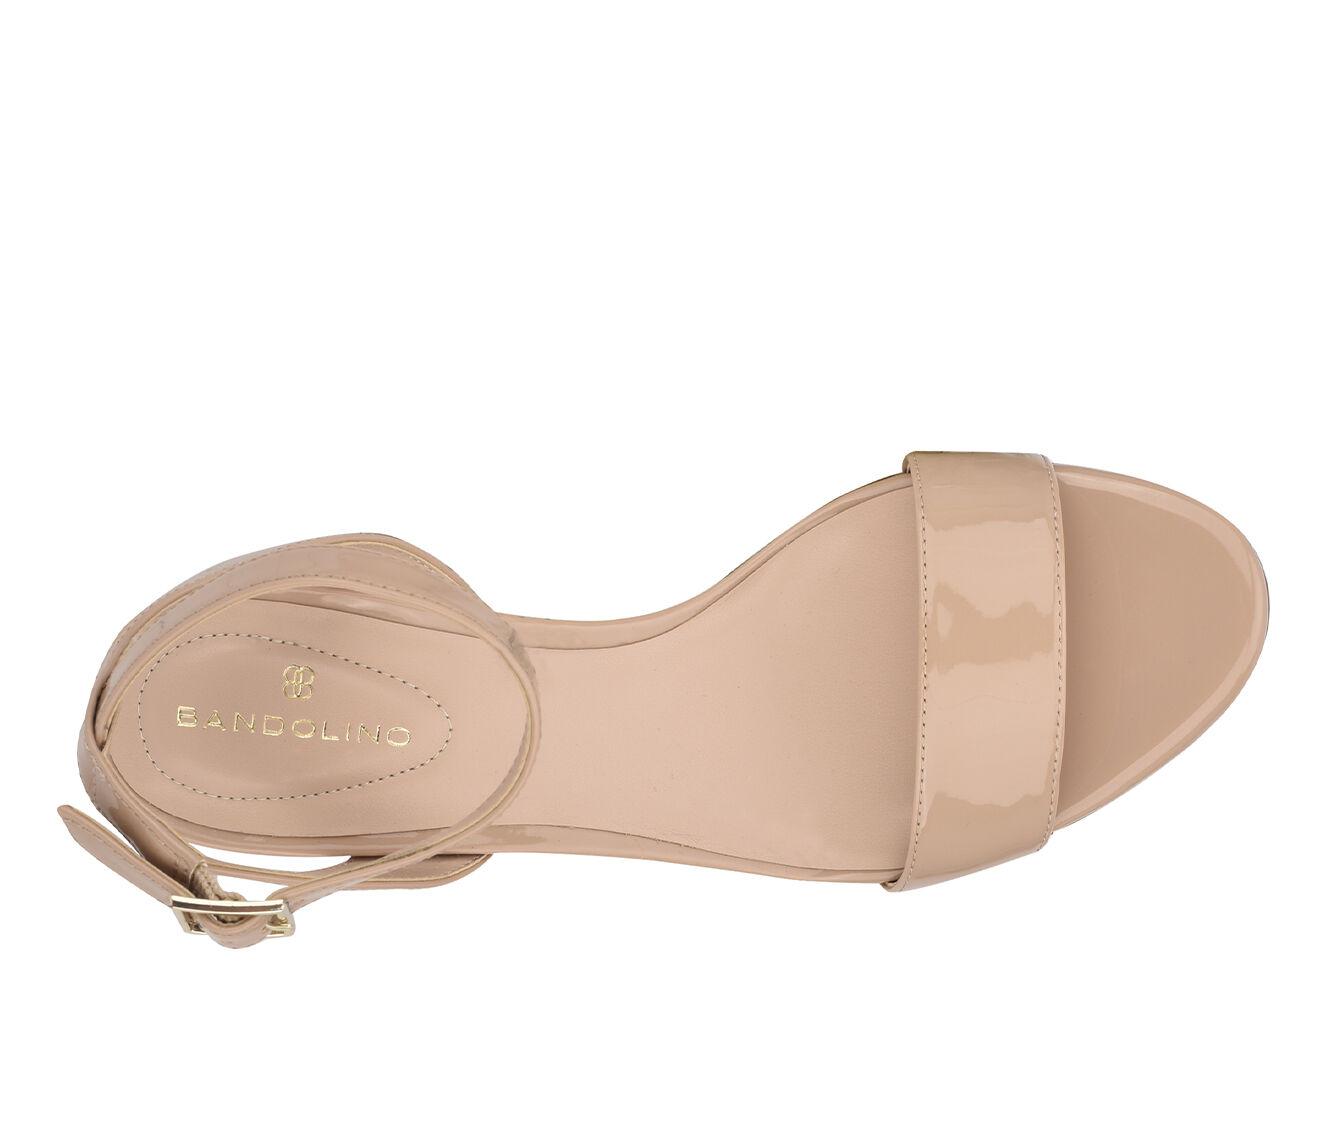 Women's Bandolino Ansley Dress Sandals | Women's shoes | 2020 New tZAIS